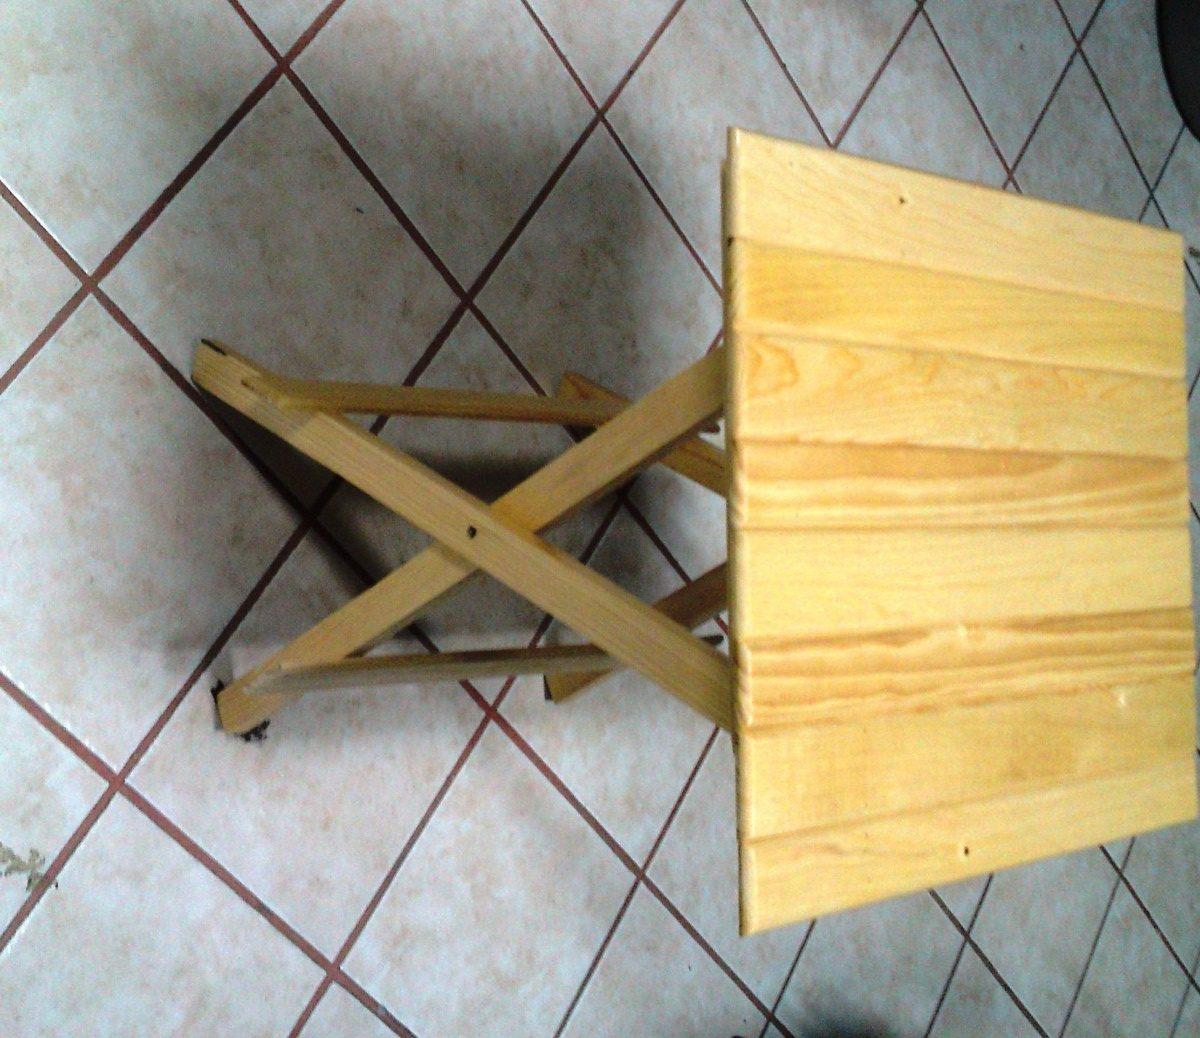 Comprar ofertas platos de ducha muebles sofas spain for Muebles de madera para terraza